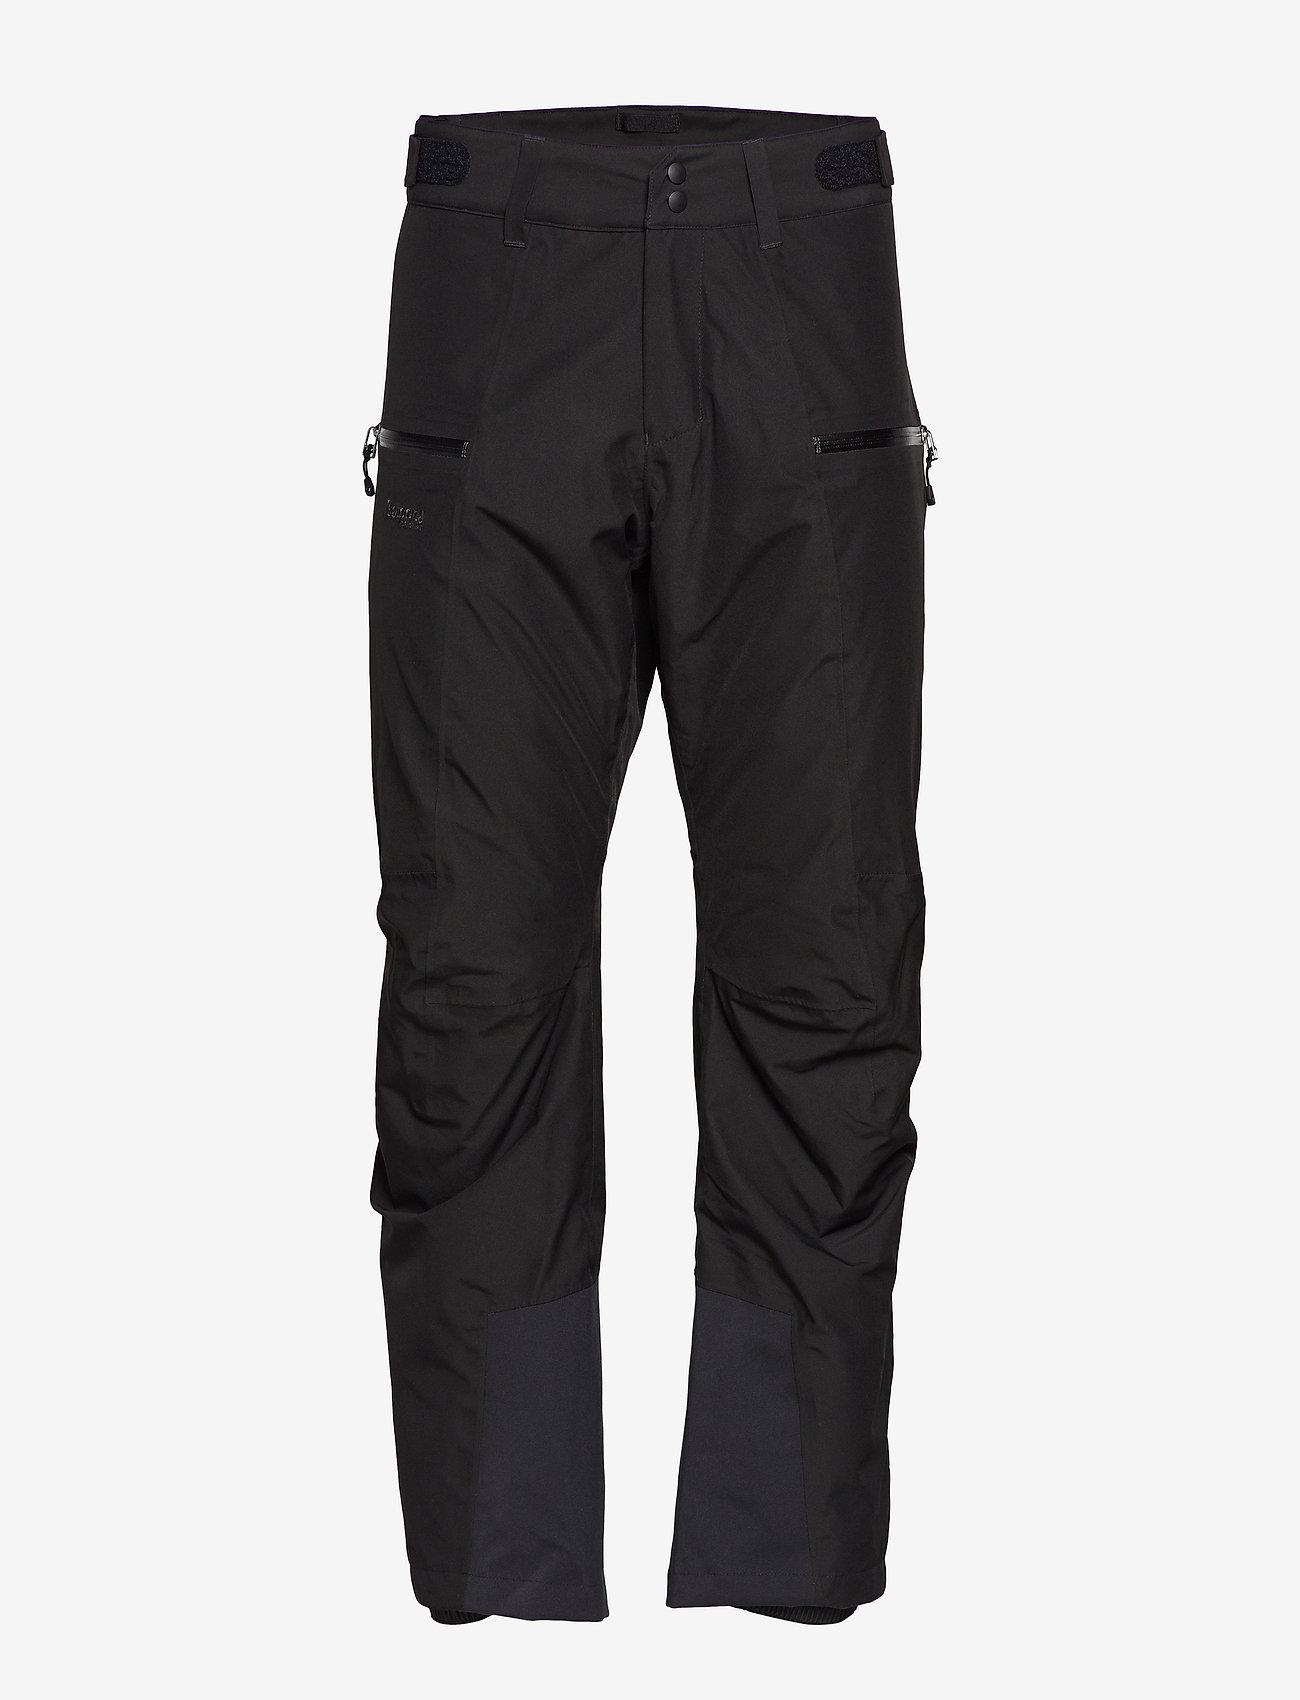 Bergans - Stranda Ins Pnt - insulated pantsinsulated pants - black/solidcharcoal - 0